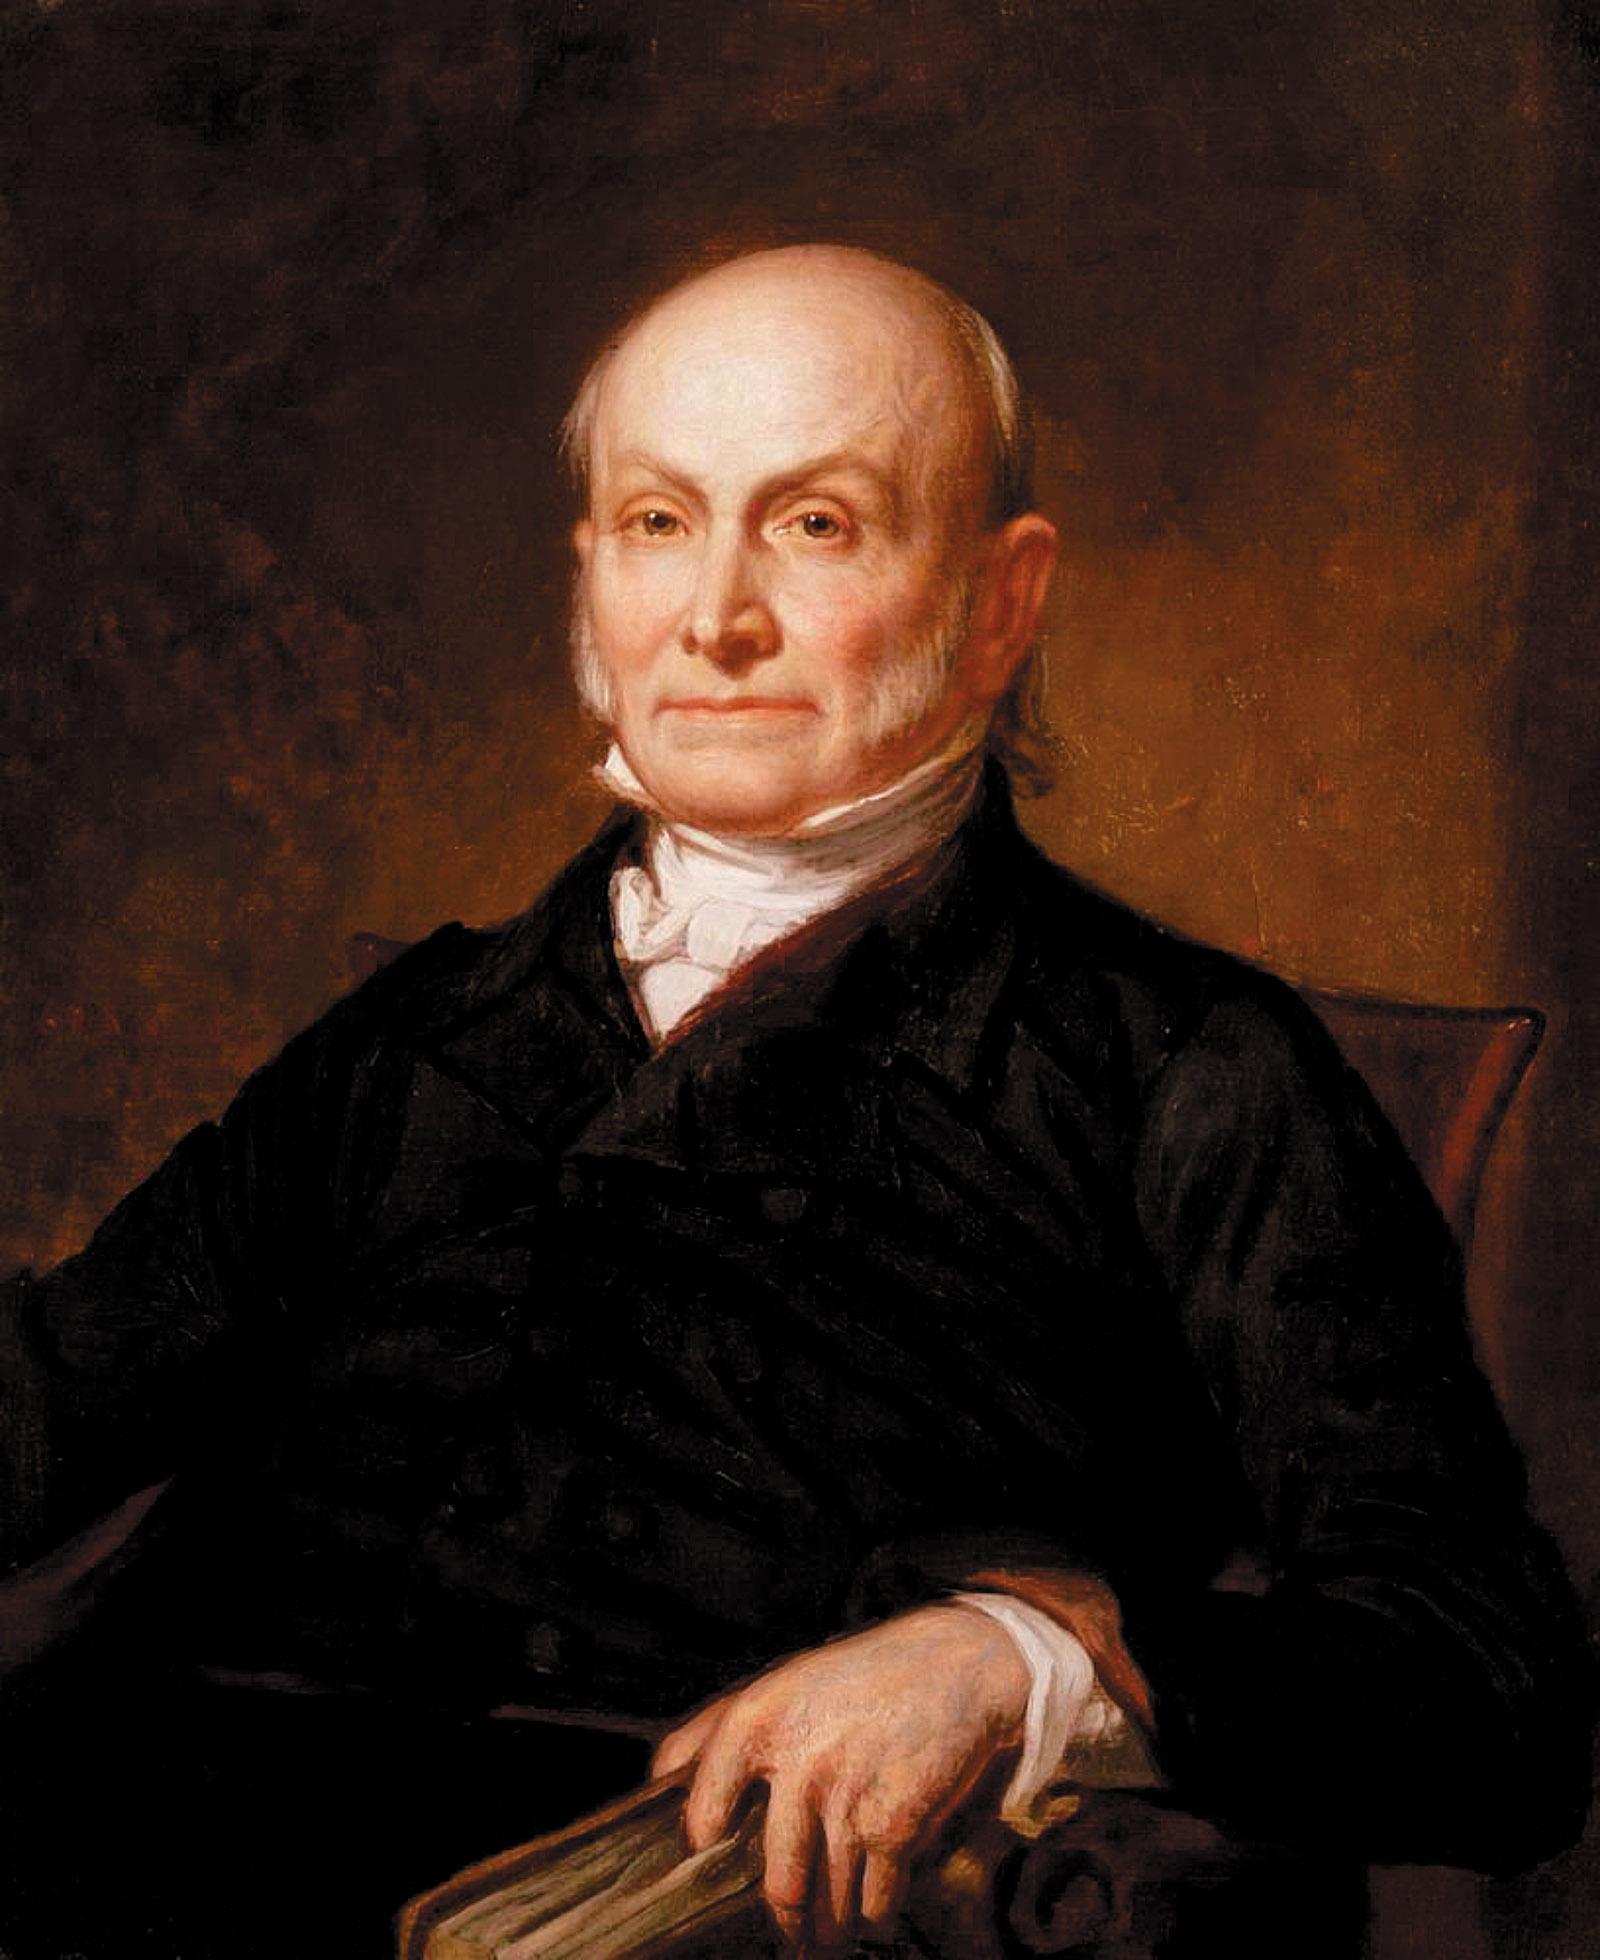 John Quincy Adams; painting by George Healy, 1846